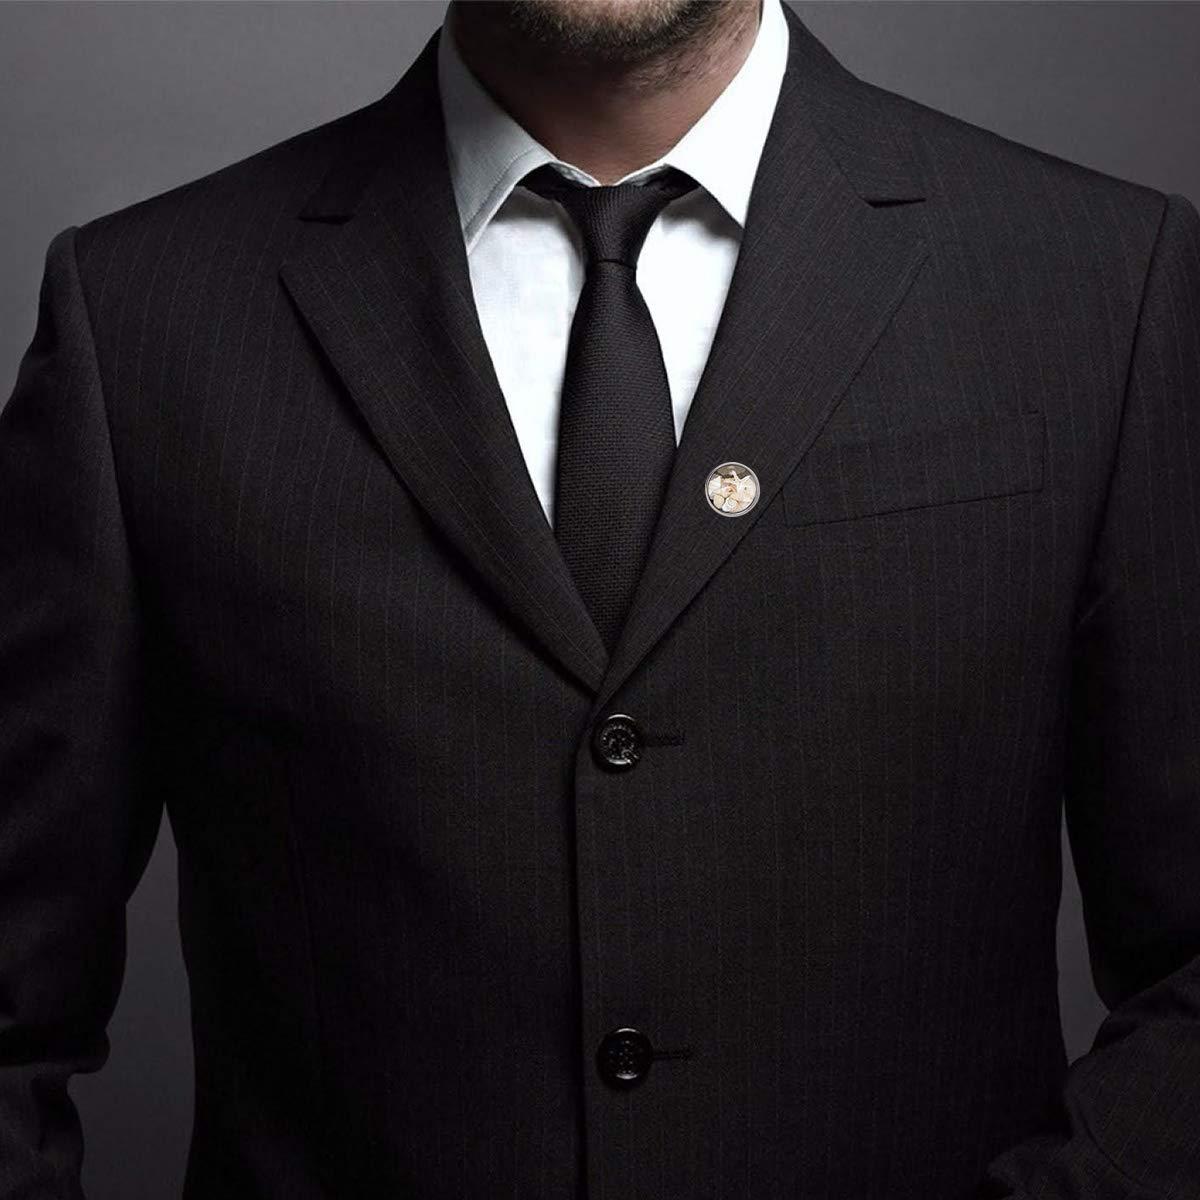 Custom Lapel Pin Brooches Beautiful Conch Banquet Badge Pins Trendy Accessory Jacket T-Shirt Bag Hat Shoe